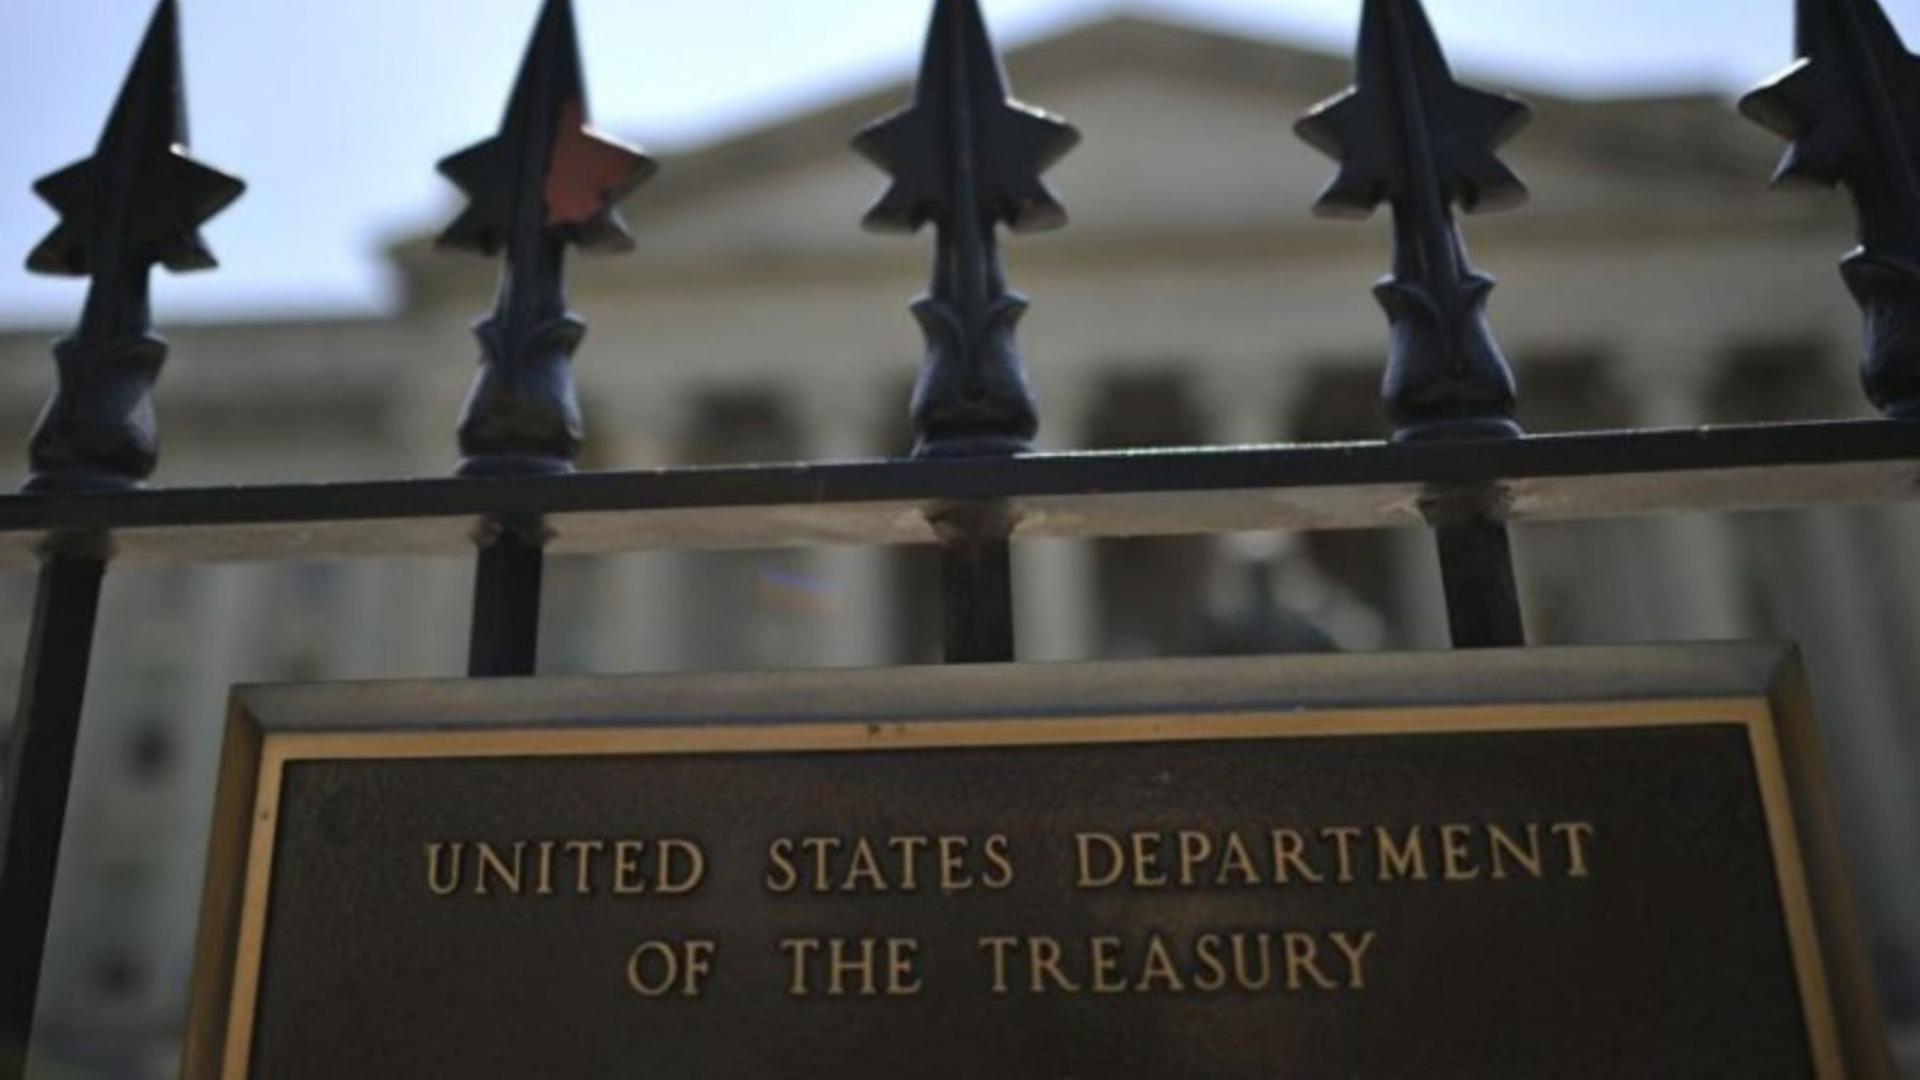 Tesoro de EE.UU extiende licencia que protege a la filial petrolera venezolana CITGO